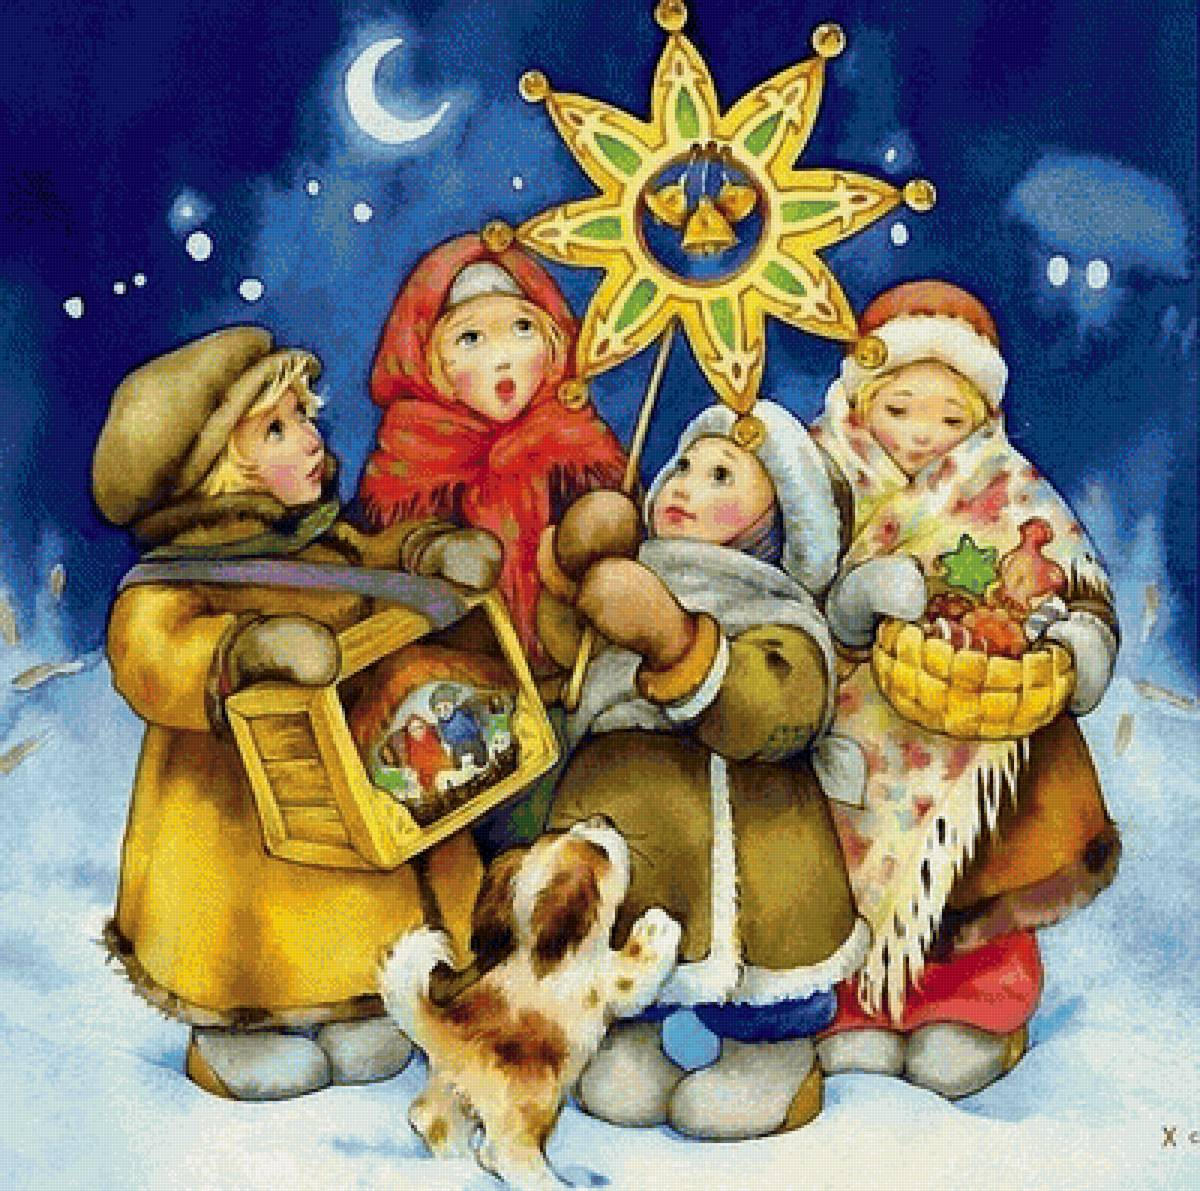 Картинки о празднике рождества